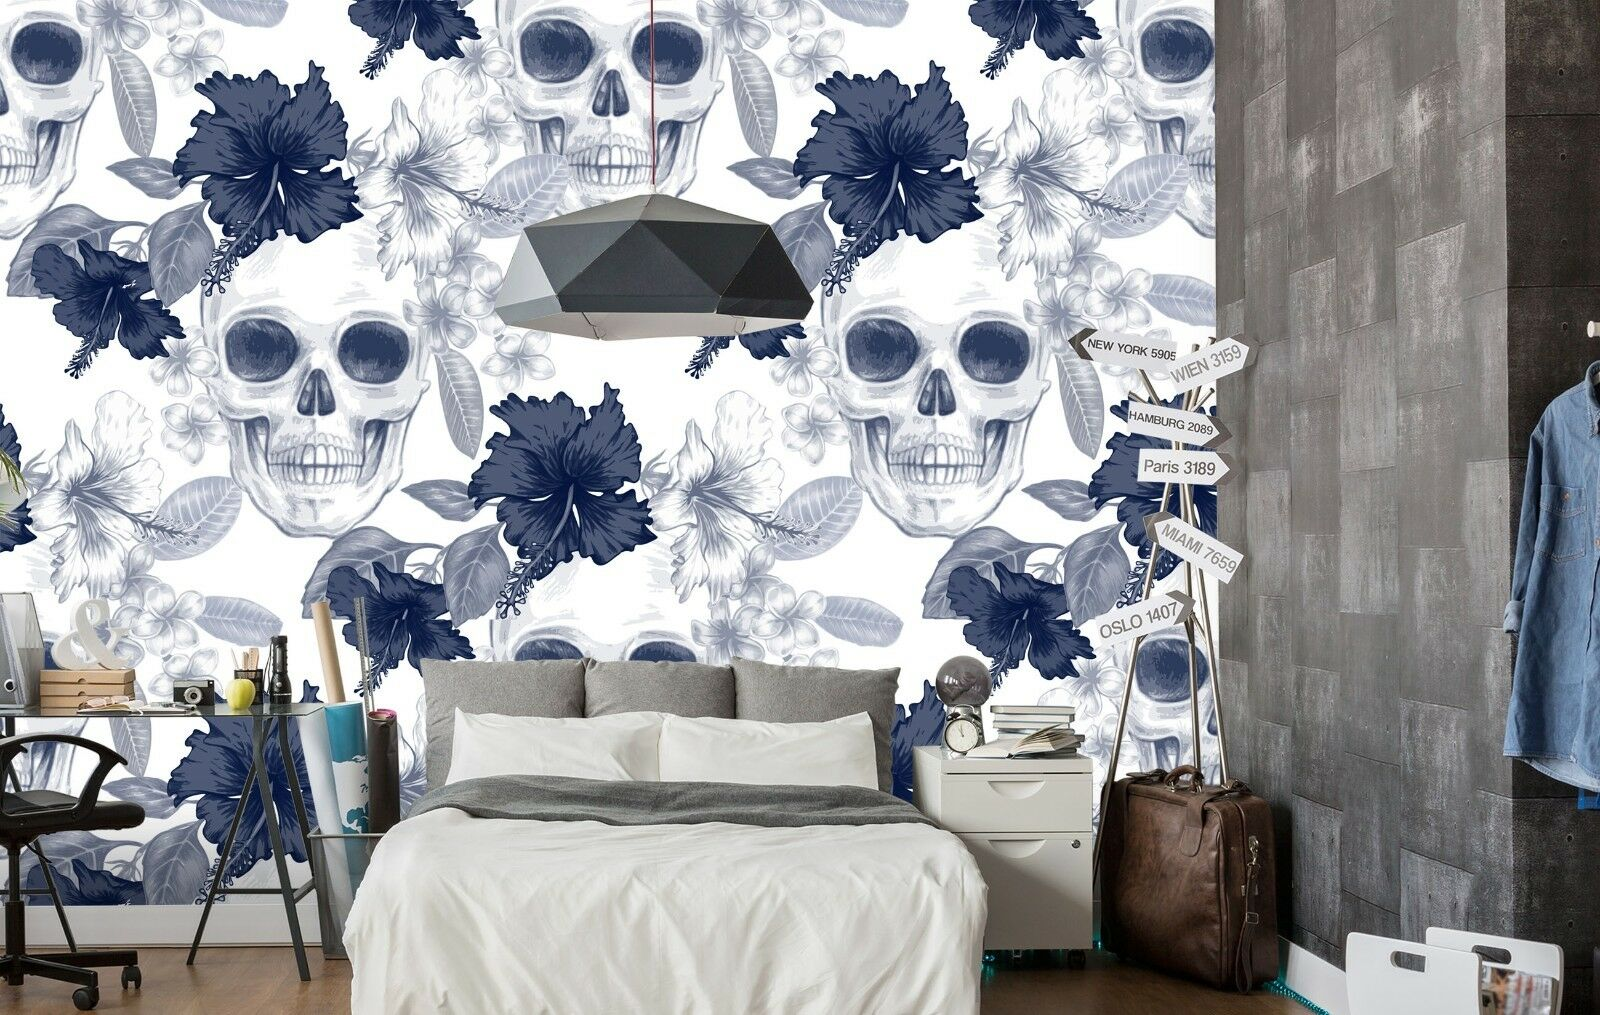 3D Skull Fower 784 Wallpaper Mural Paper Wall Print Murals UK Sidney